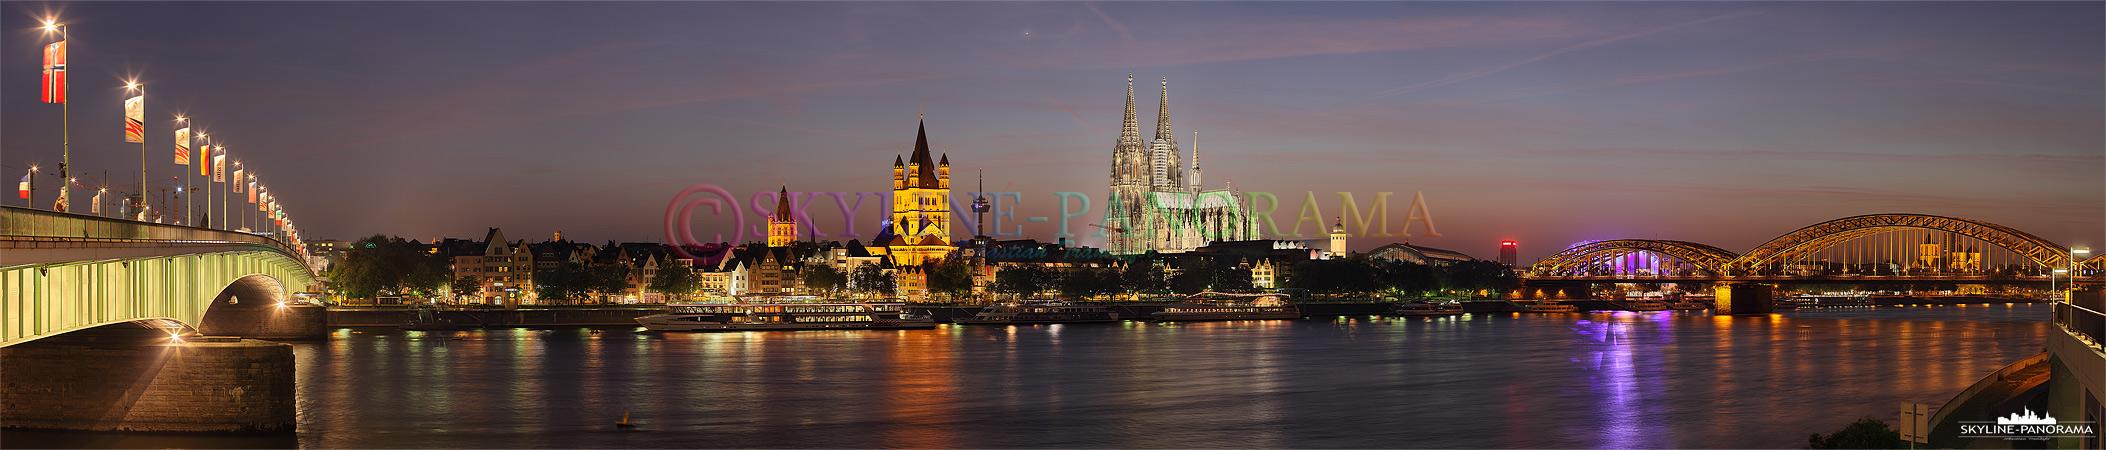 Kölner Skyline Panorama nach dem Sonnenuntergang im Abendrot.